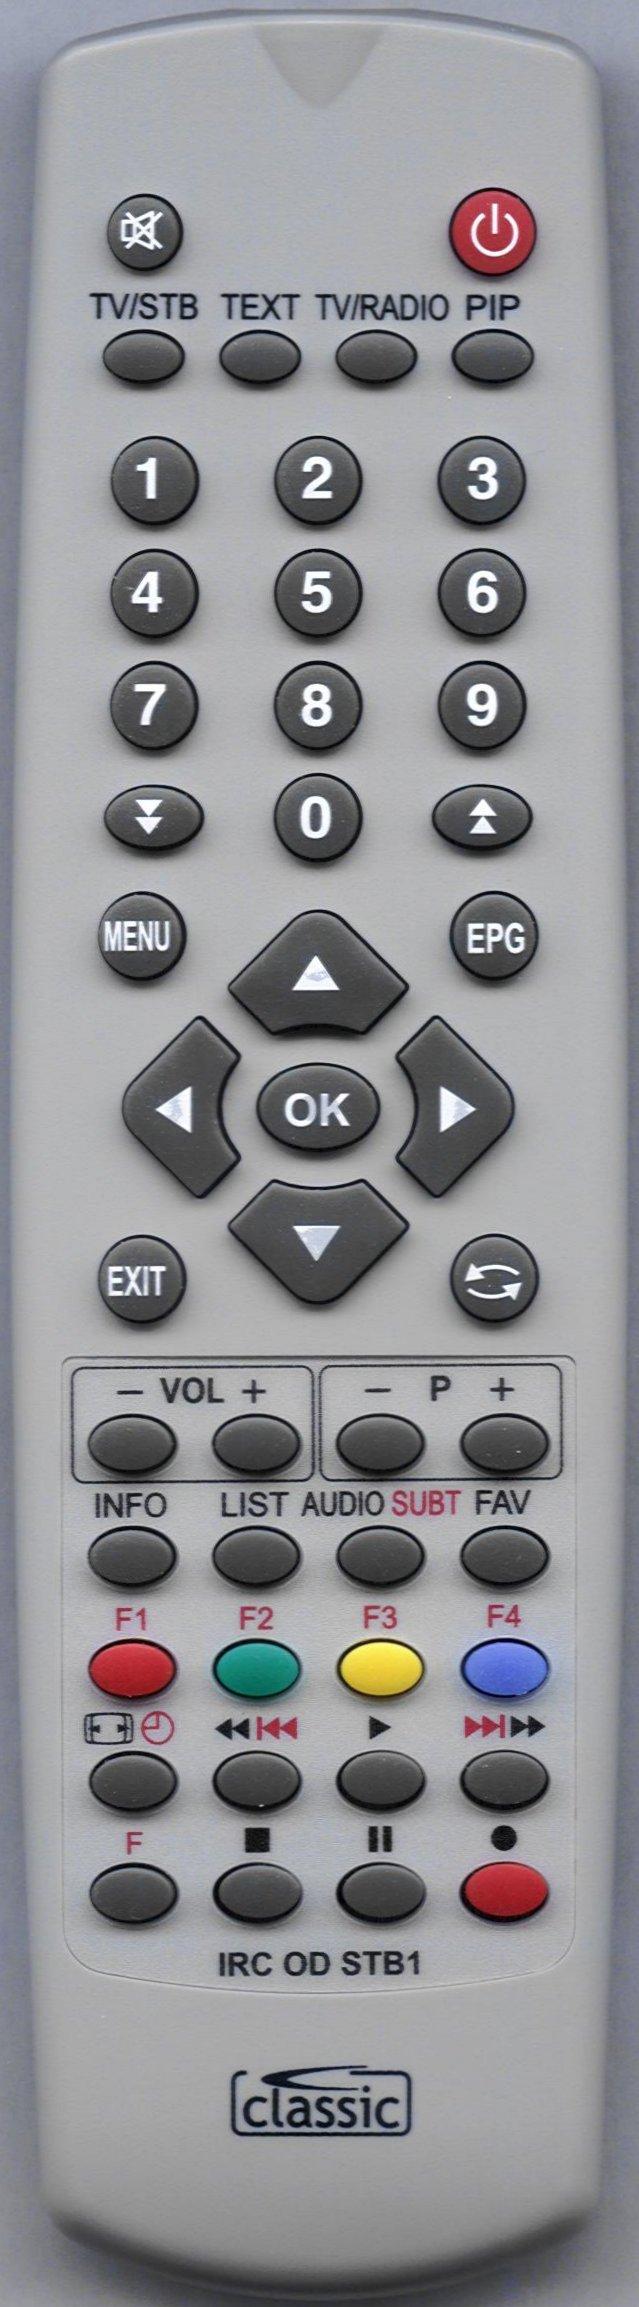 TVONICS DTR-HV250 Remote Control